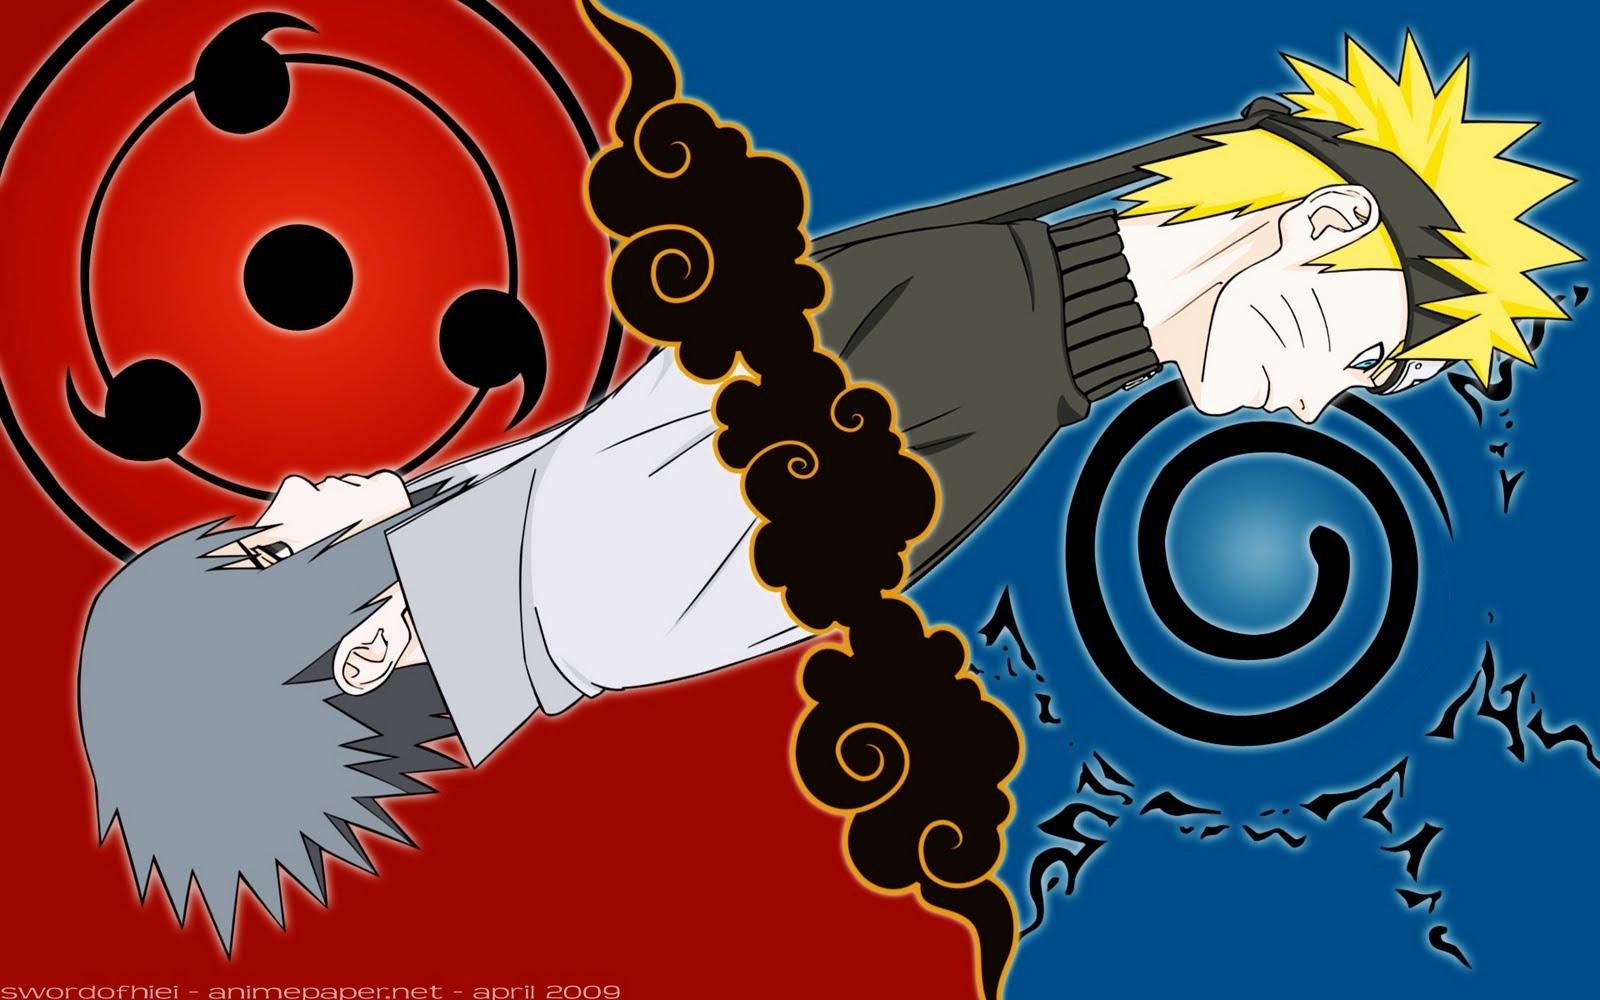 http://2.bp.blogspot.com/-y8ml-UXP4Q4/TkB8fG_zD1I/AAAAAAAAAIE/E7k0vB_Uv74/s1600/AnimePaperwallpapers_Naruto_swordofhiei1.6_1920x1200_93756.jpg